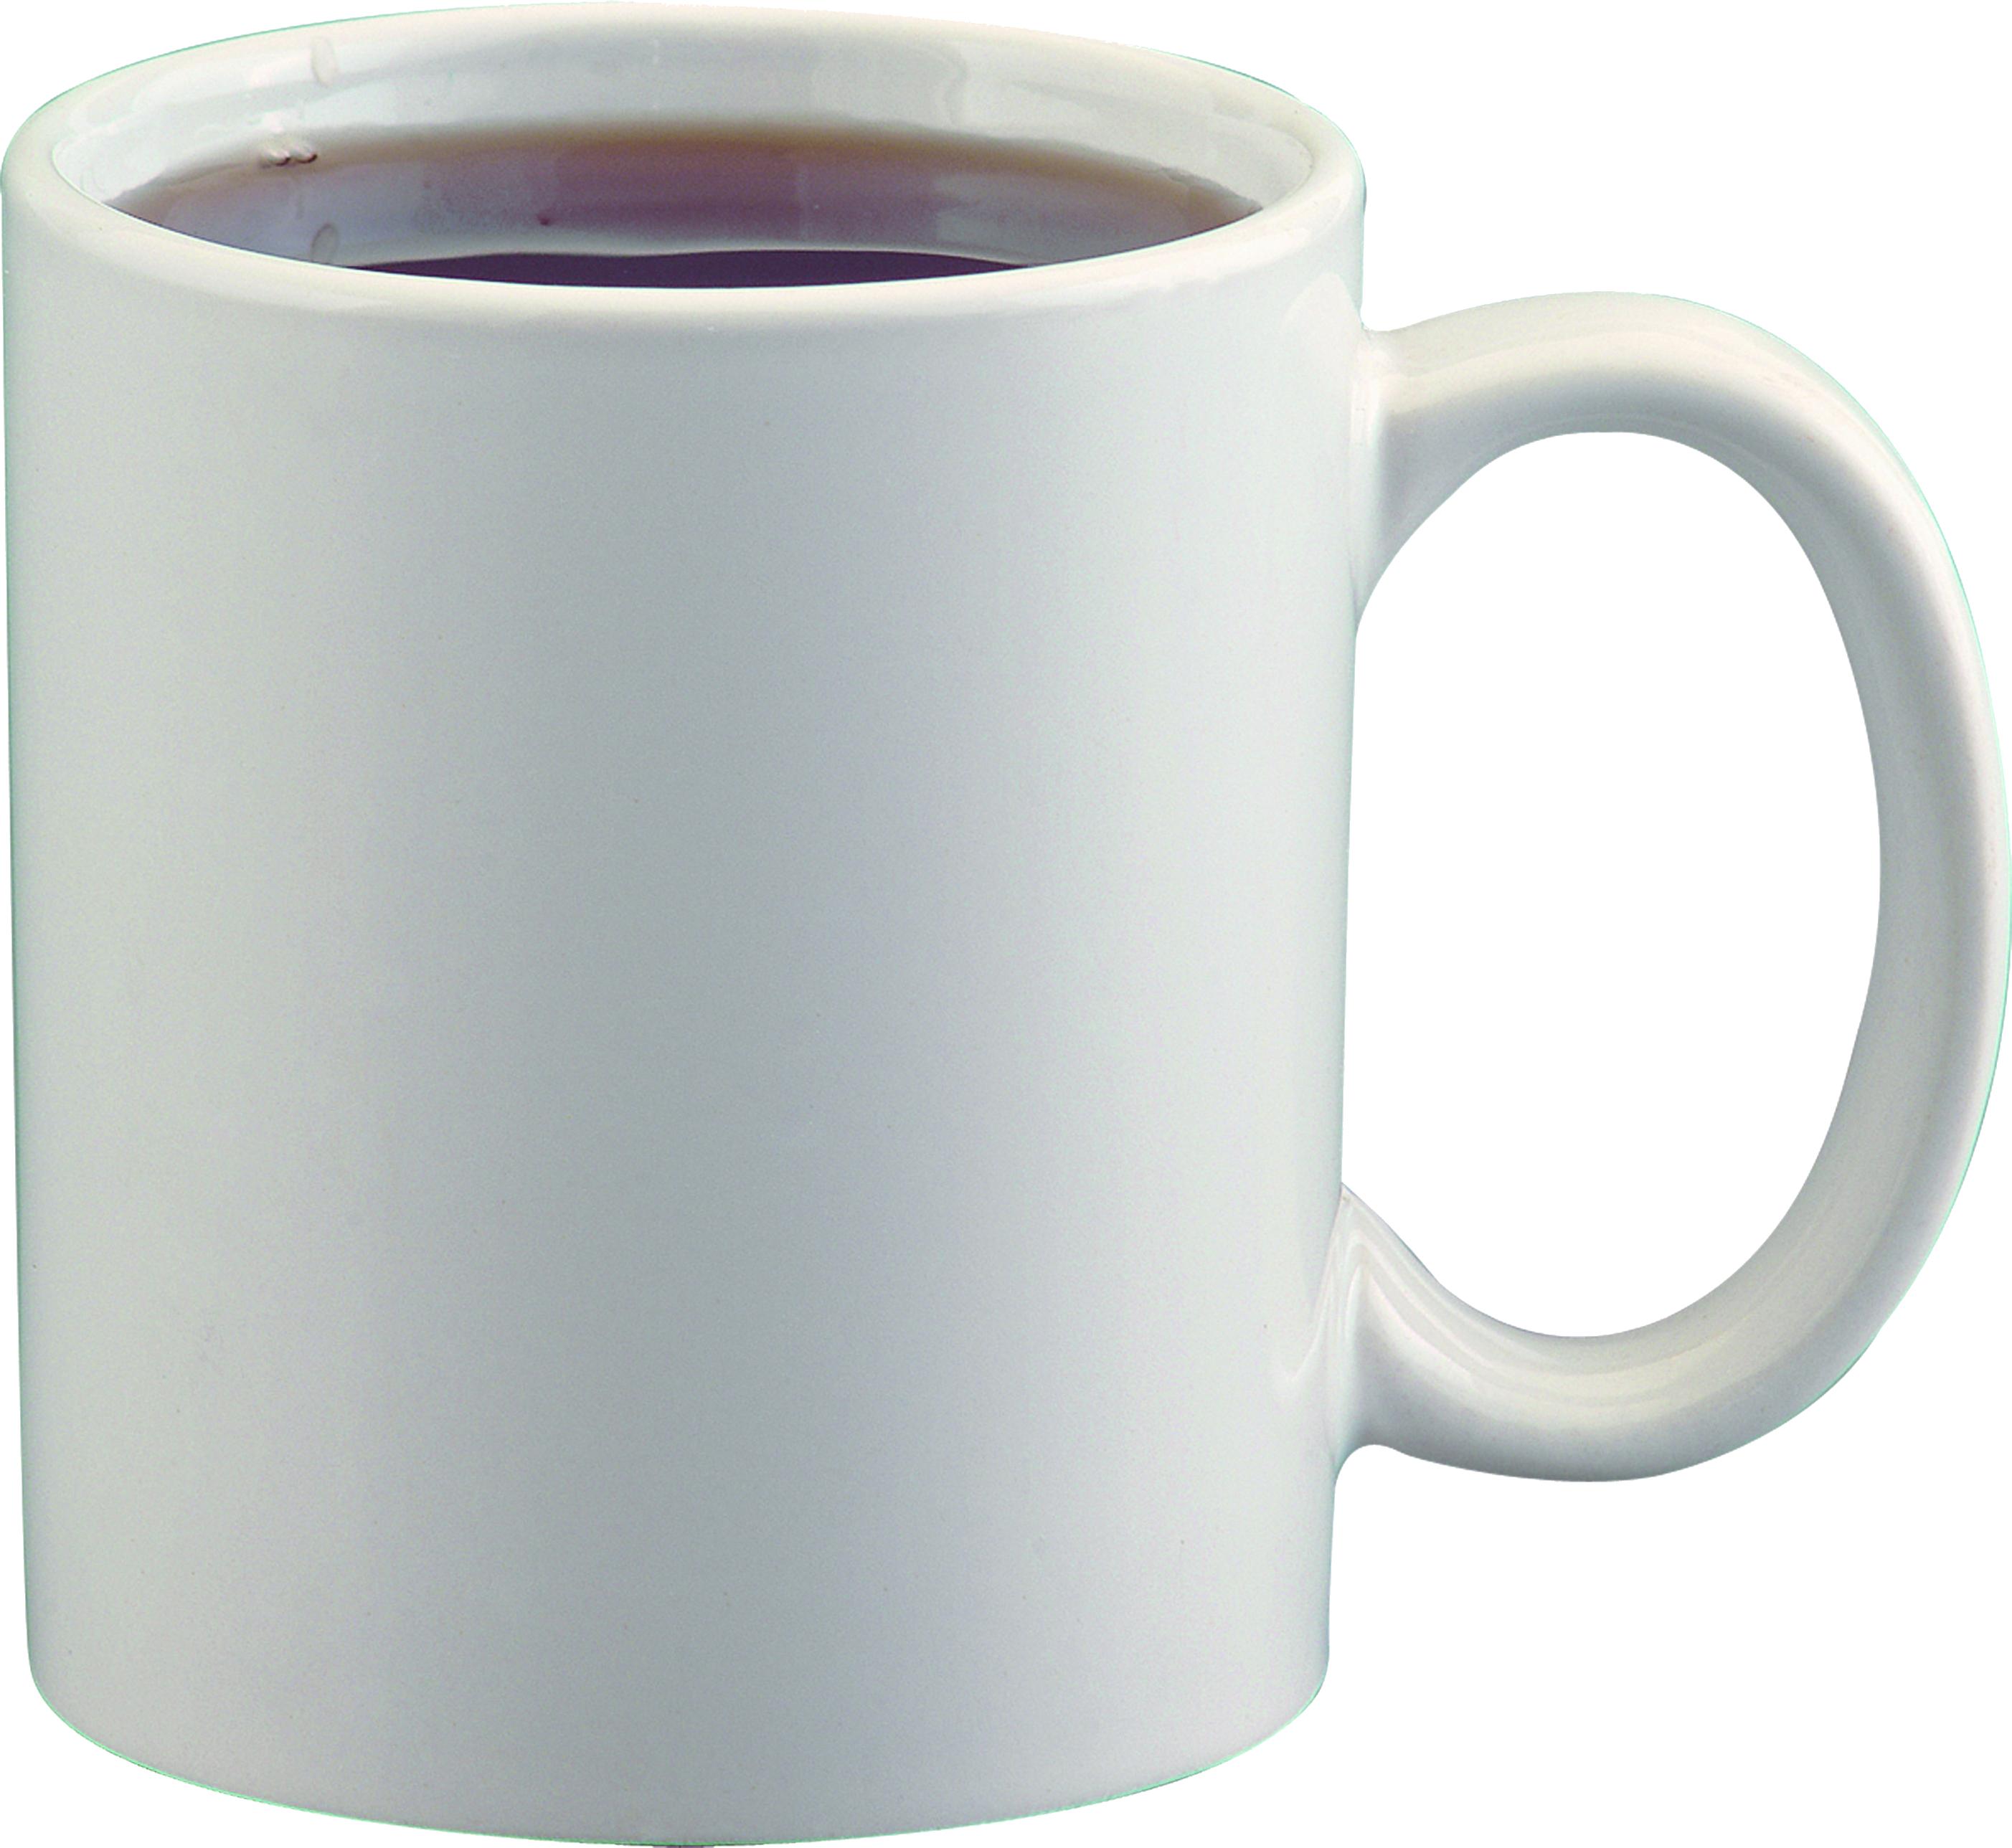 Cup, Mug Coffee PNG Image - PurePNG | Free transparent CC0